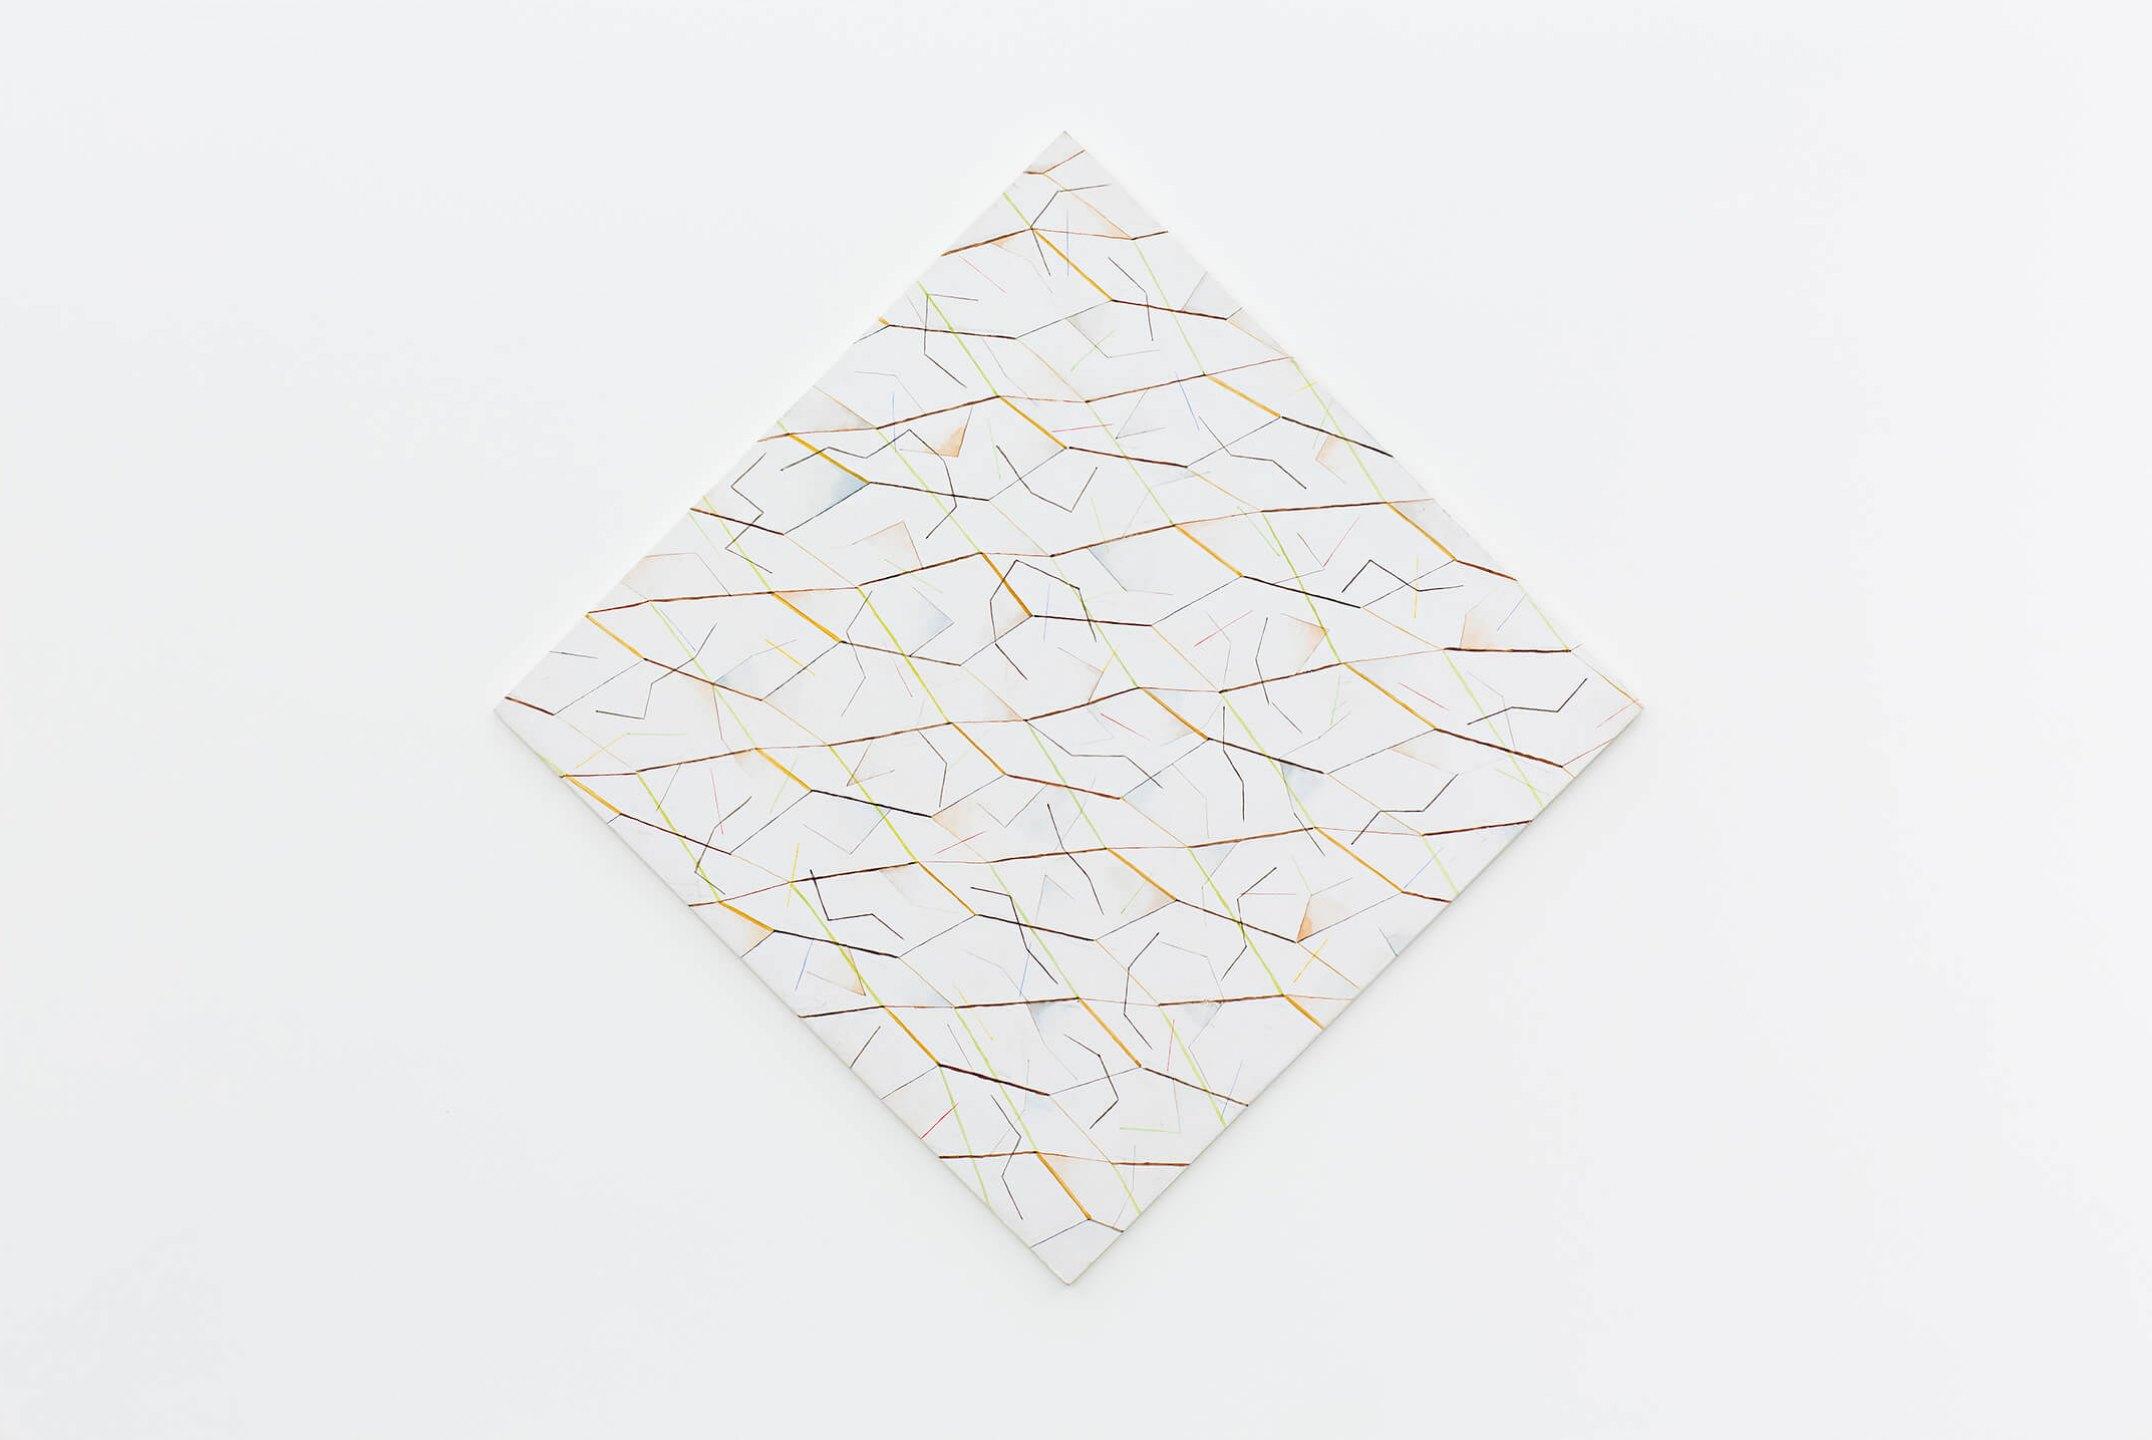 Daniel Steegmann Mangrané,<em> Morfogênesis/Crípsis</em>,2013,oil and watercolor on MDF, 62 × 62 cm<br> - Mendes Wood DM